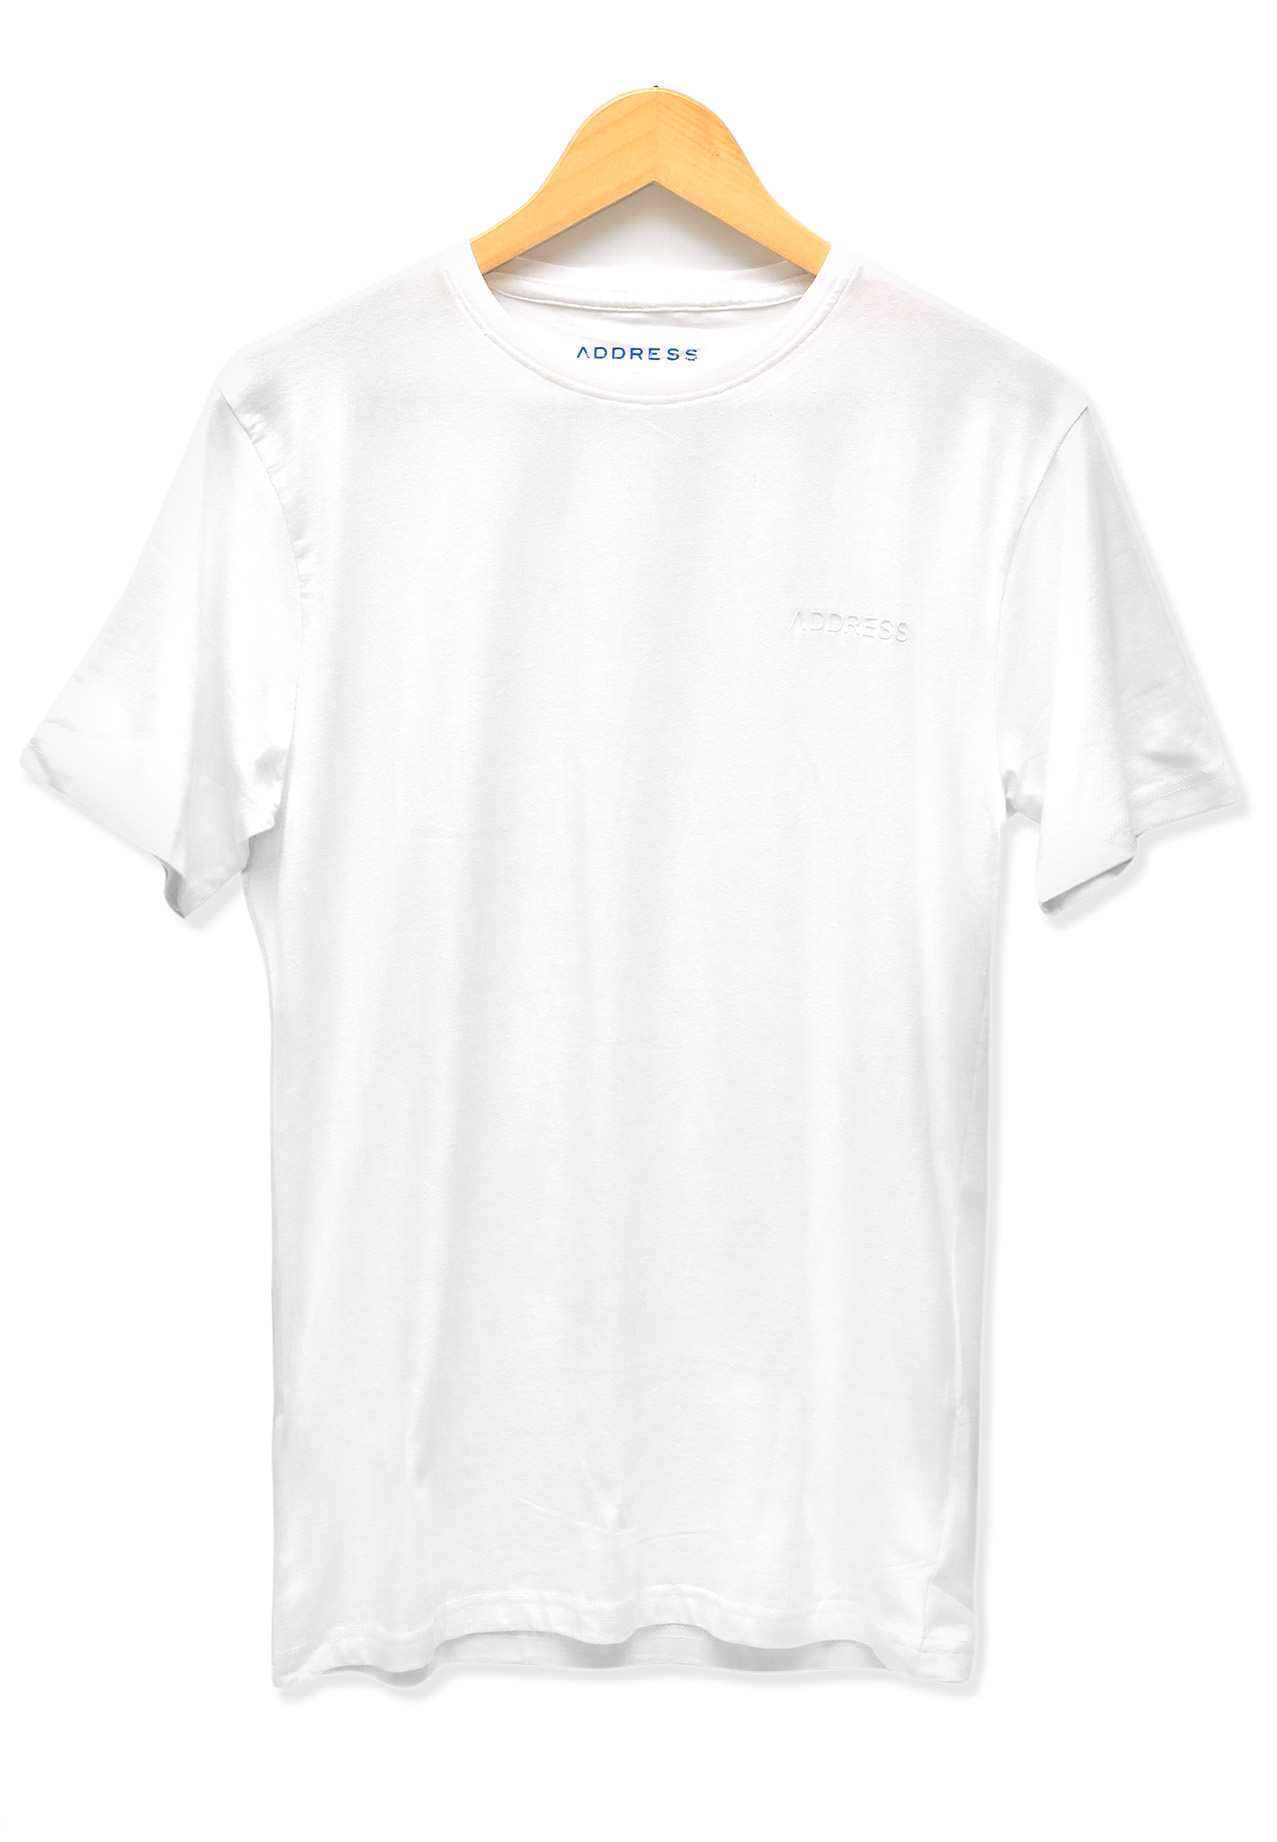 Address White Plain T-Shirt Round Neck, XL